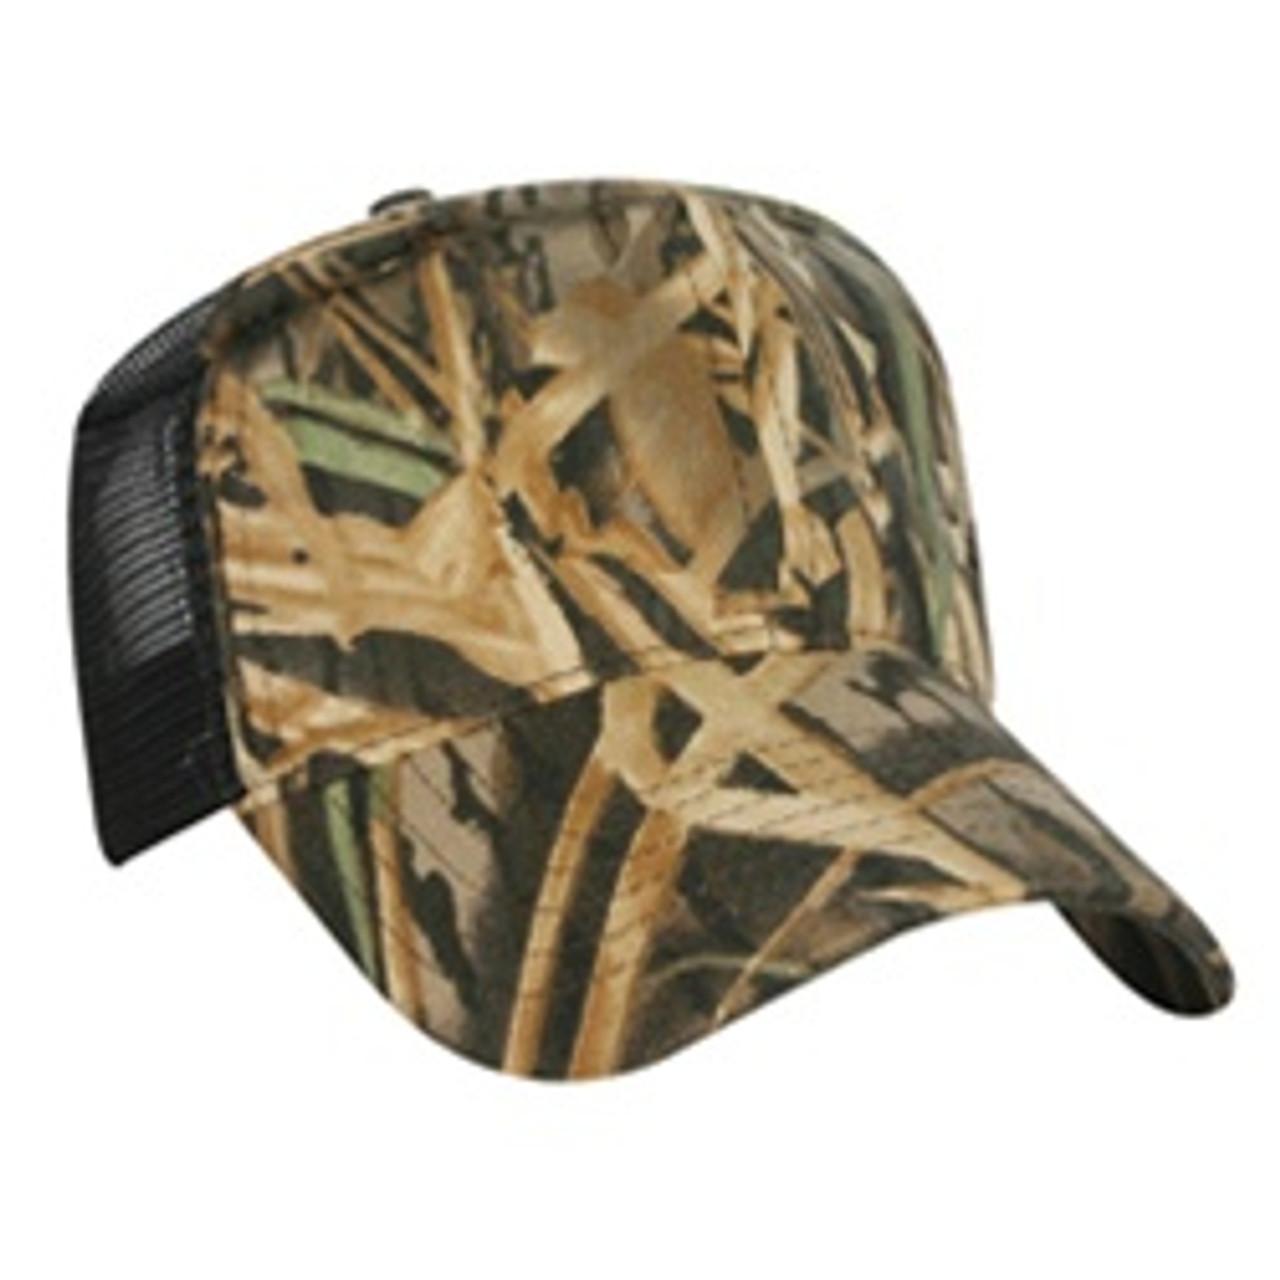 Custom Structured Mossy Oak Military High Profile Mesh Cap